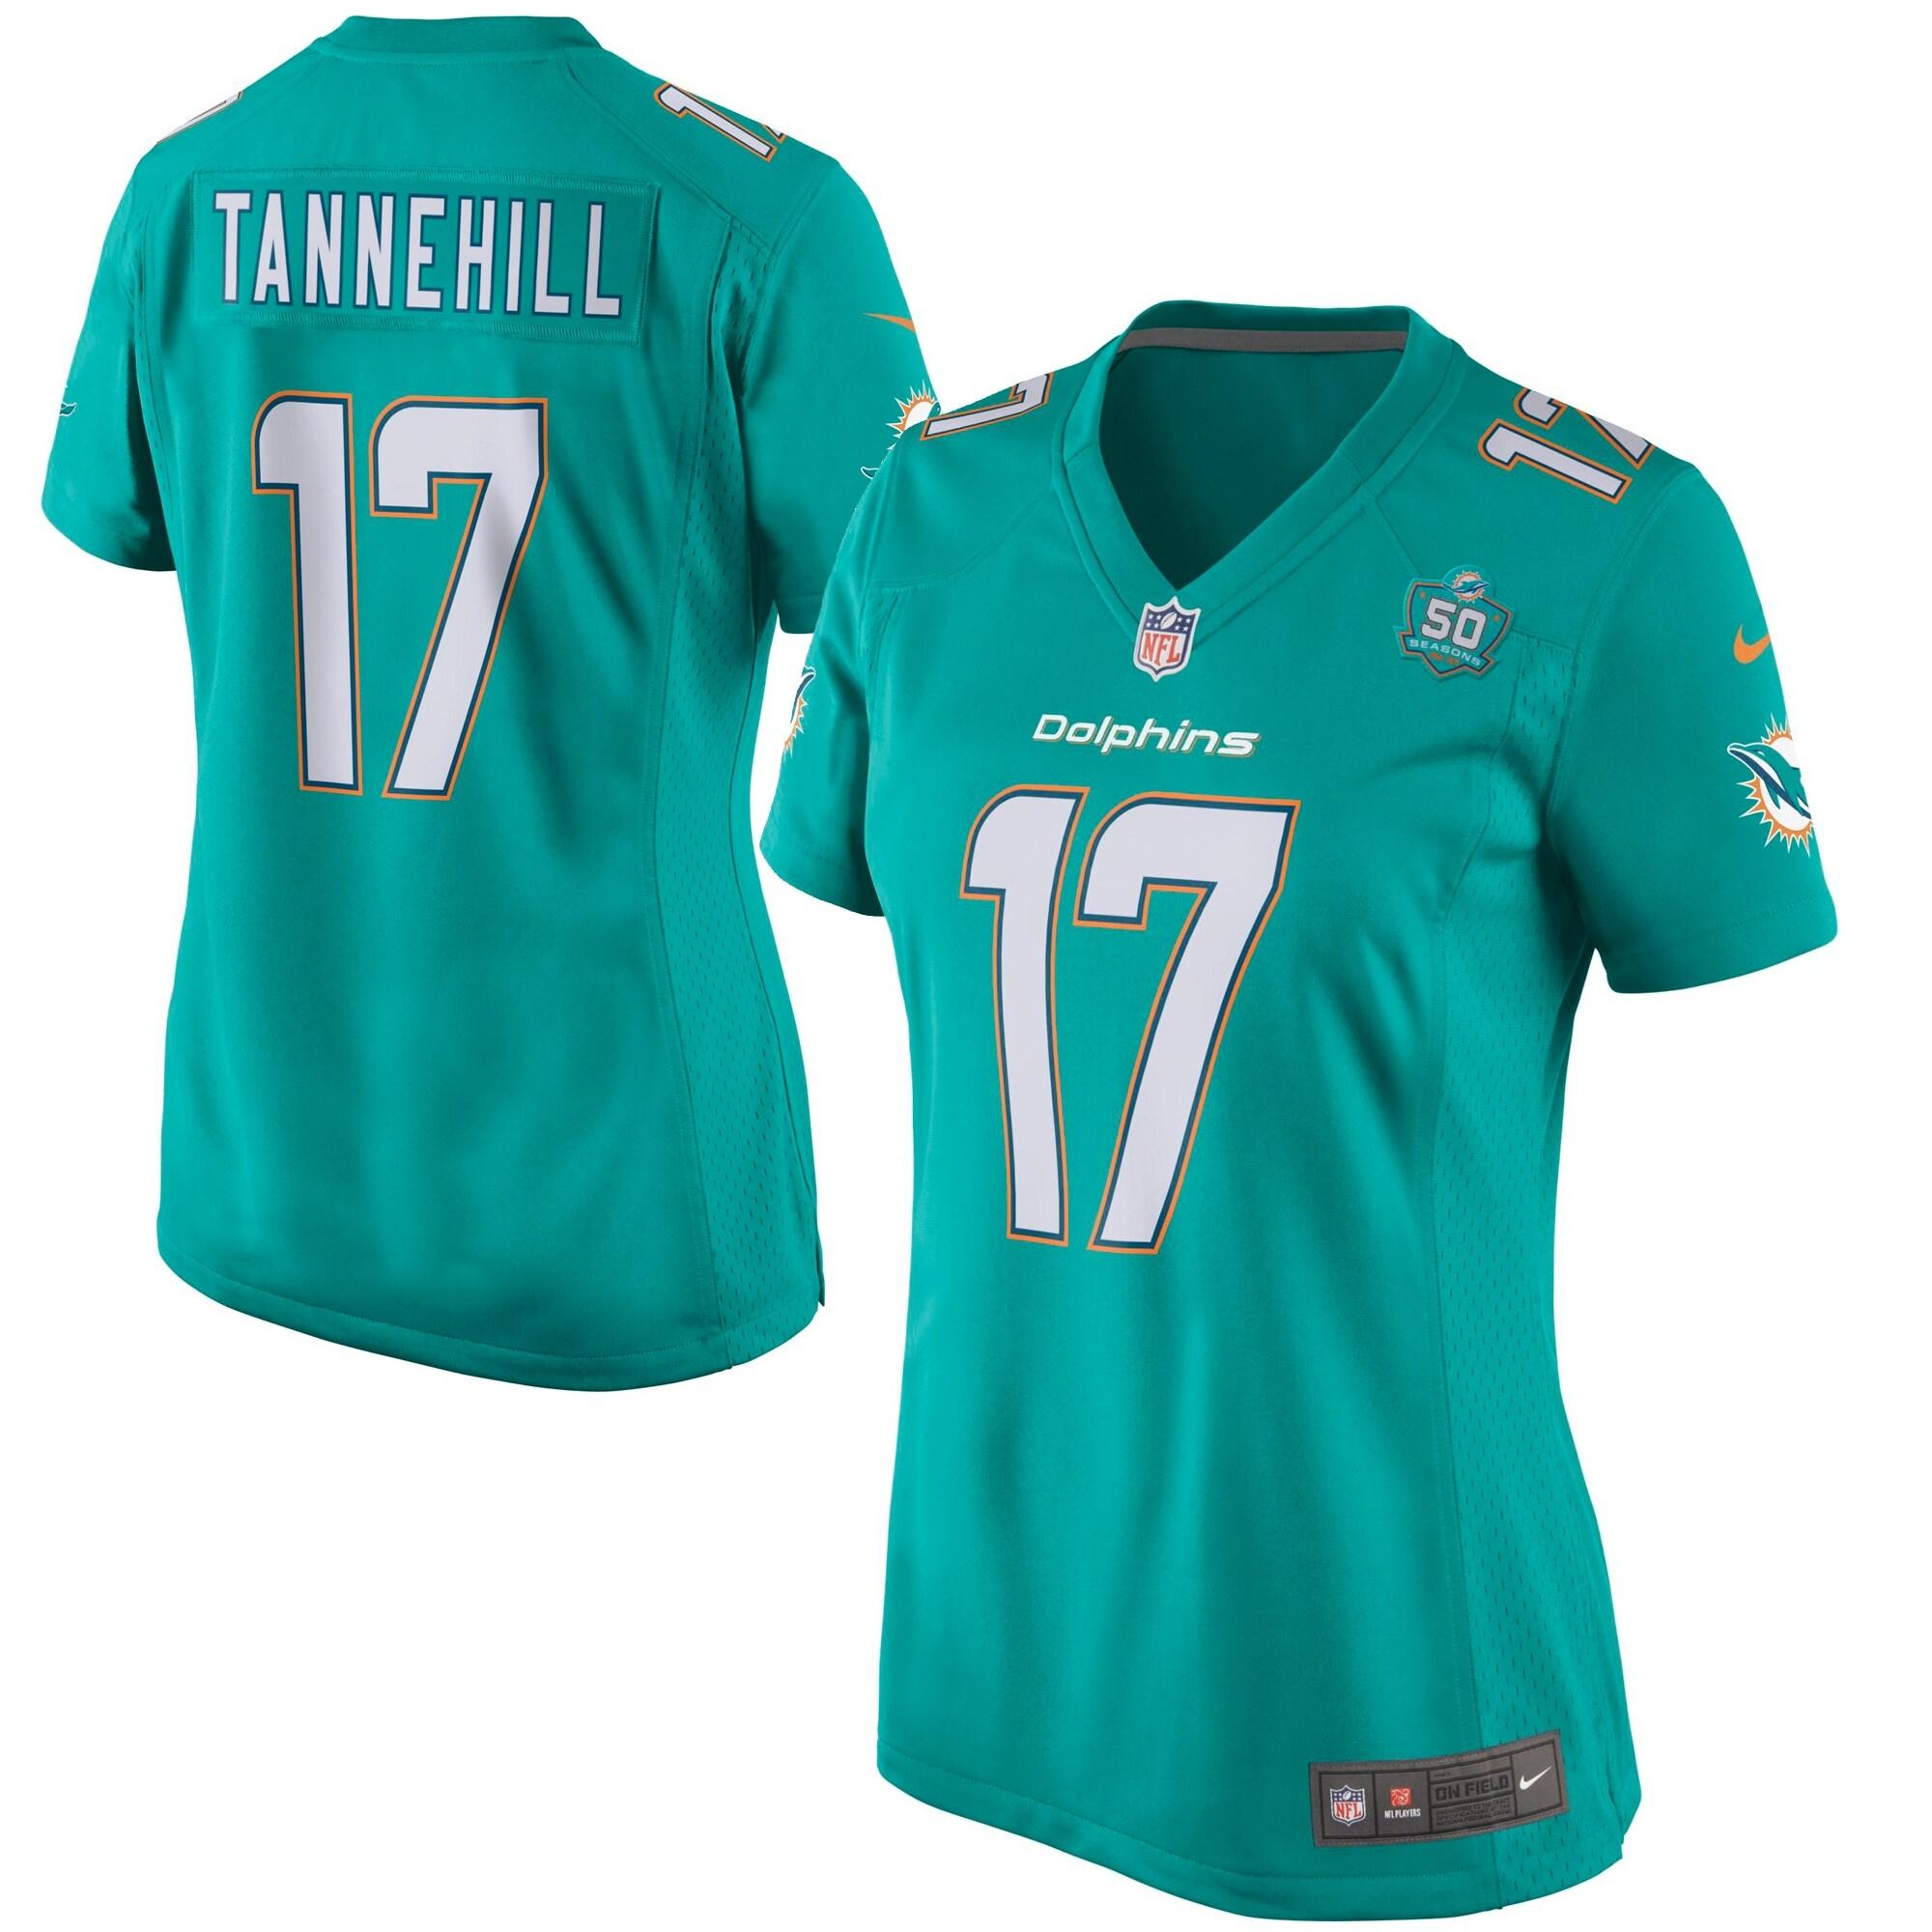 Ryan Tannehill Miami Dolphins Nike Women's Team Game 2015 NFL Patch Jersey - Aqua